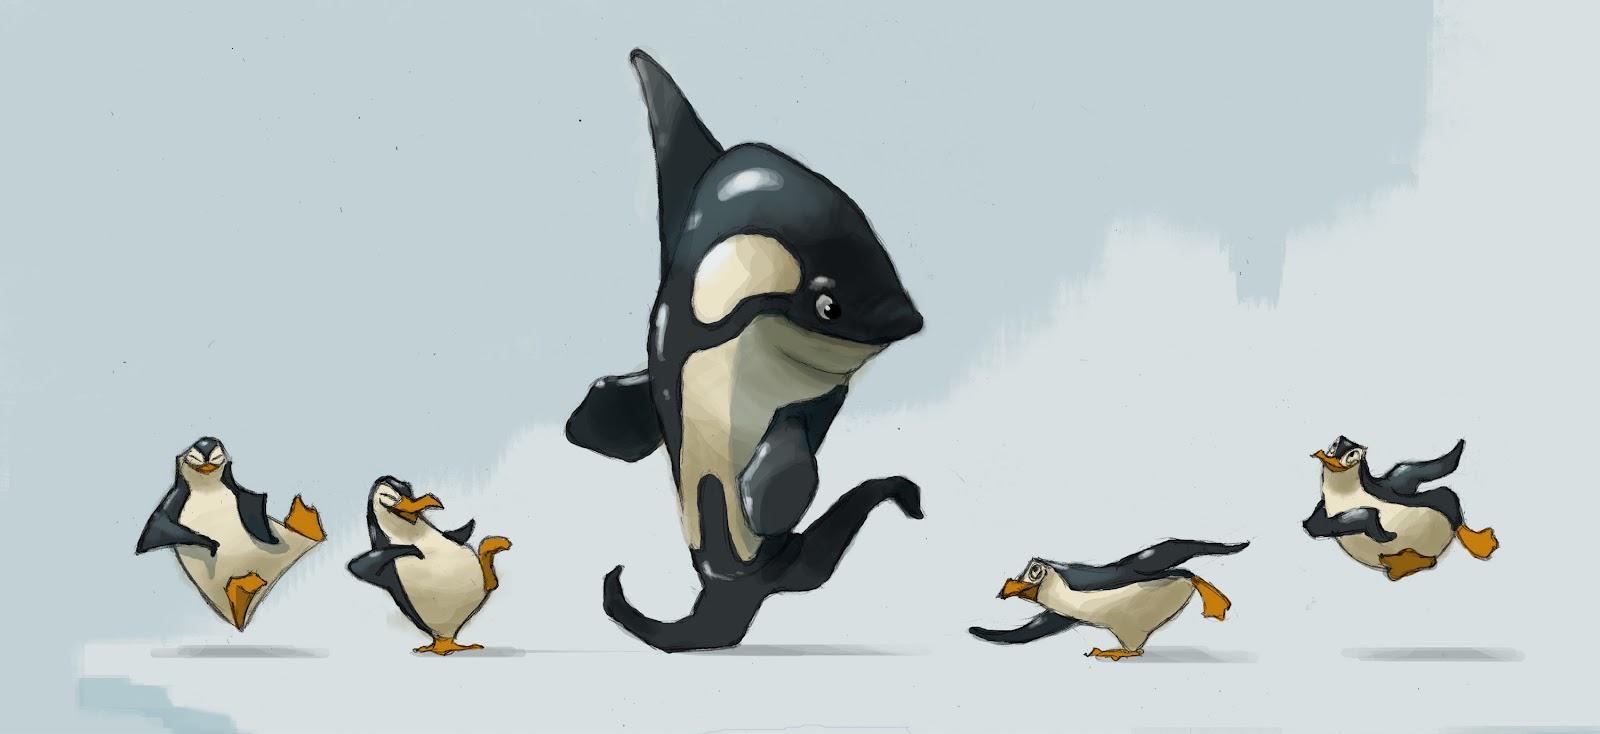 Танец пингвина гифка